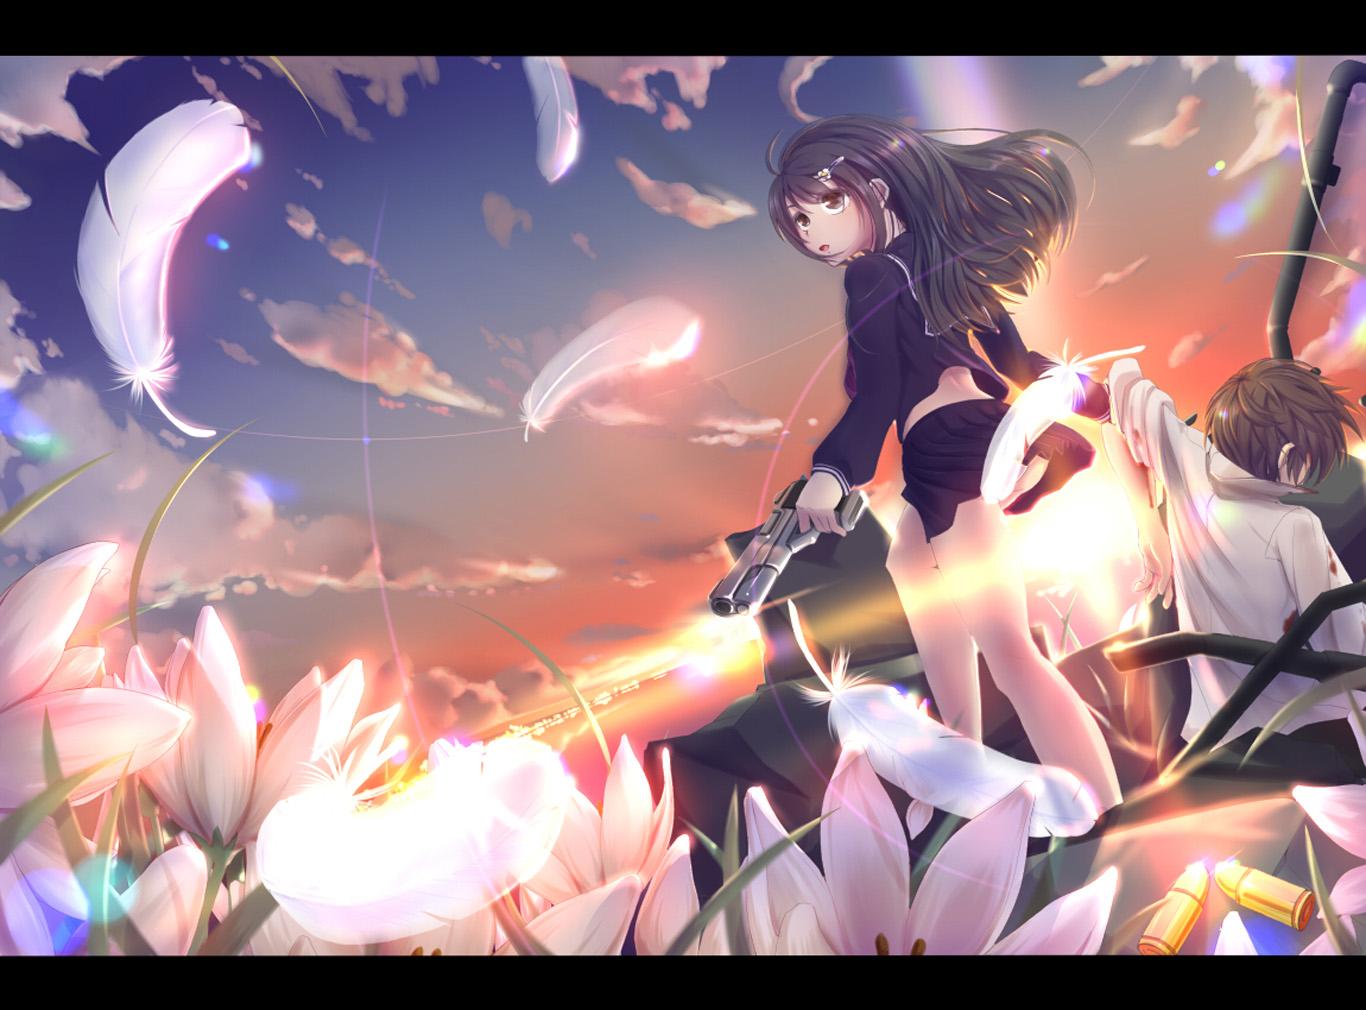 hwfd - anime girl flowers and sunset desktop background (1366 x 1010